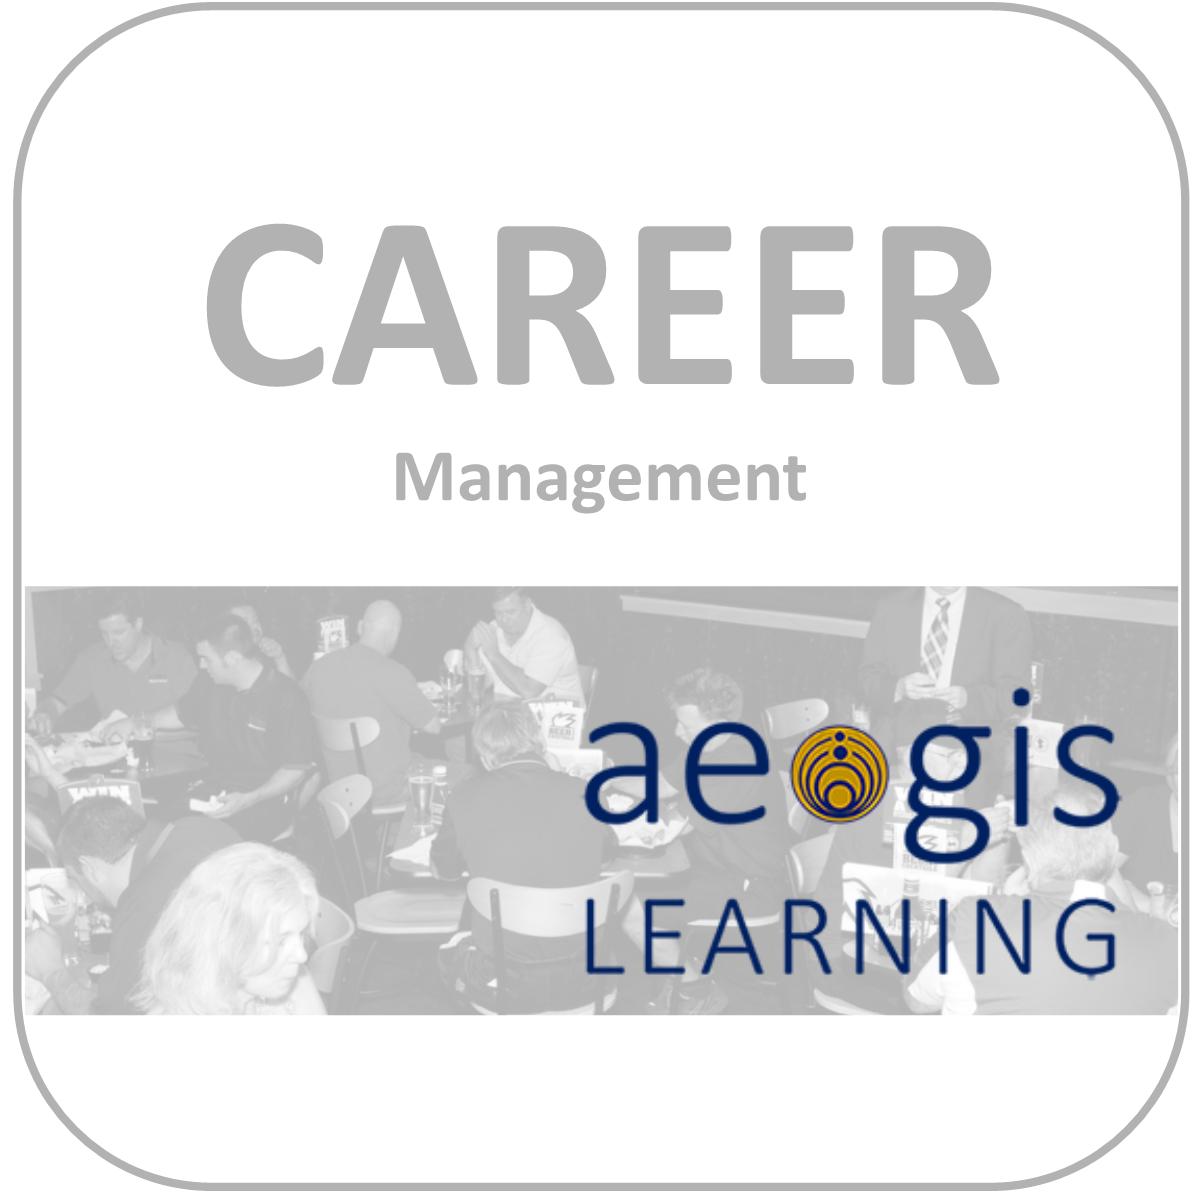 Career Management Workshop from Aegis Learning